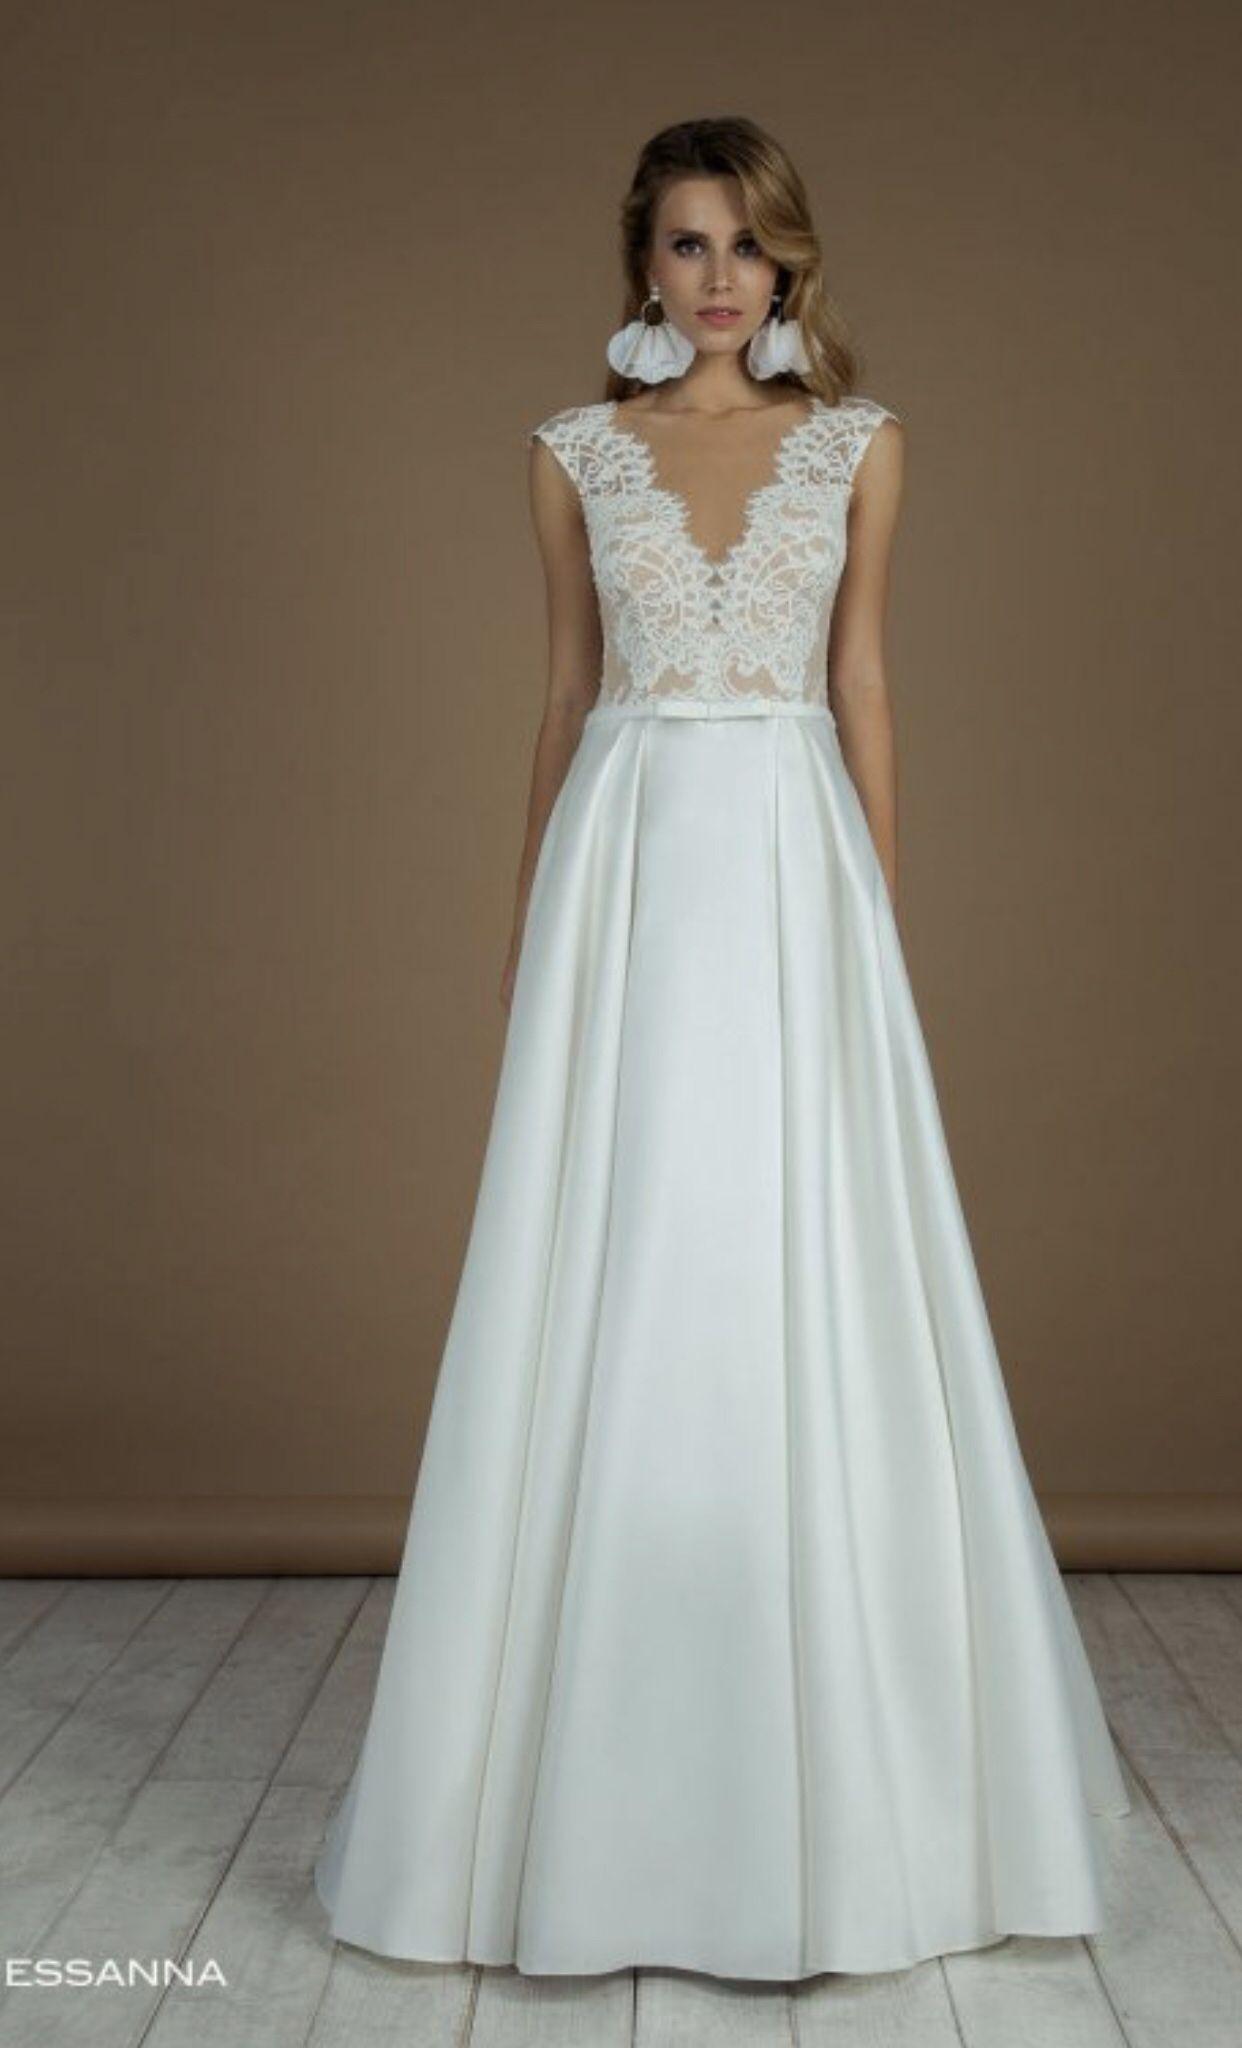 Le Rina -Brautkleid Essana -Hochzeitskleid  Brautmode, Brautkleid